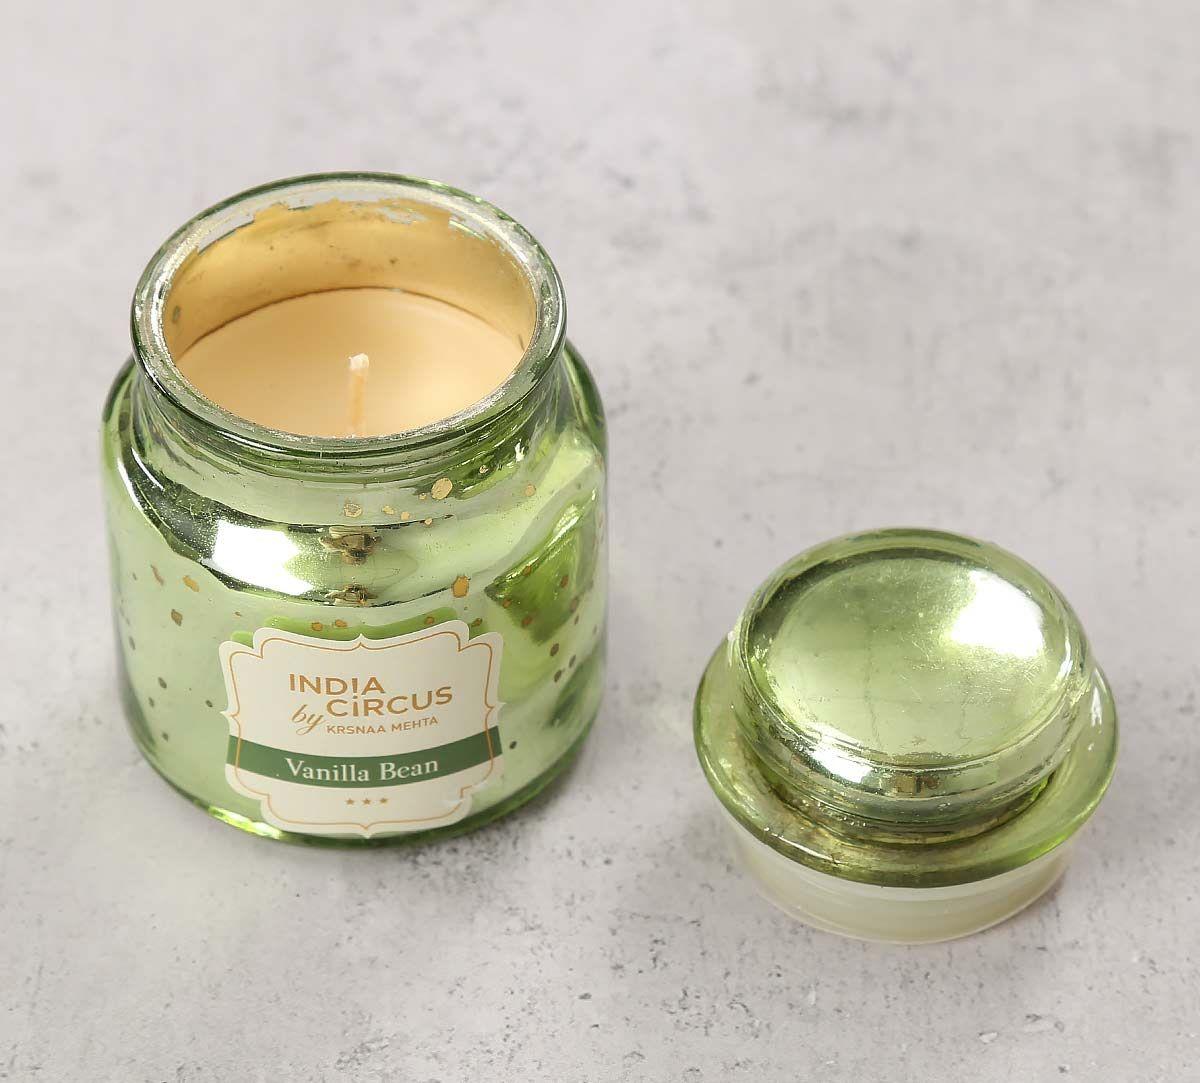 India Circus Vanilla Bean Yankee Jar Candle